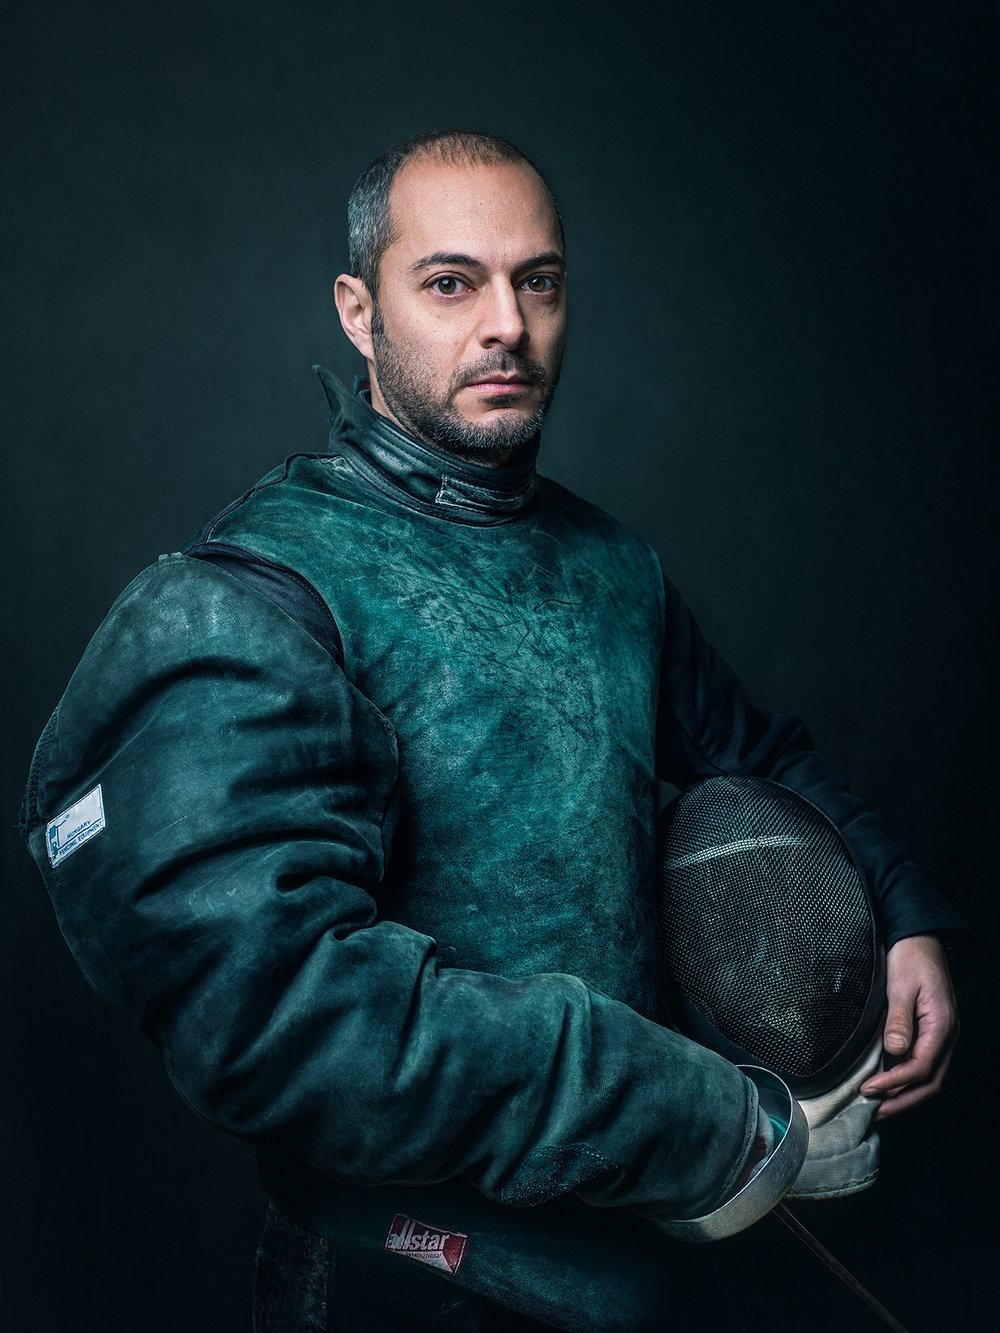 Oscar-arribas-esgrima-maestro-fencing-master-fencer-fechten-scherma-escrime-portrait-fotografo-retrato-photographer020.jpg